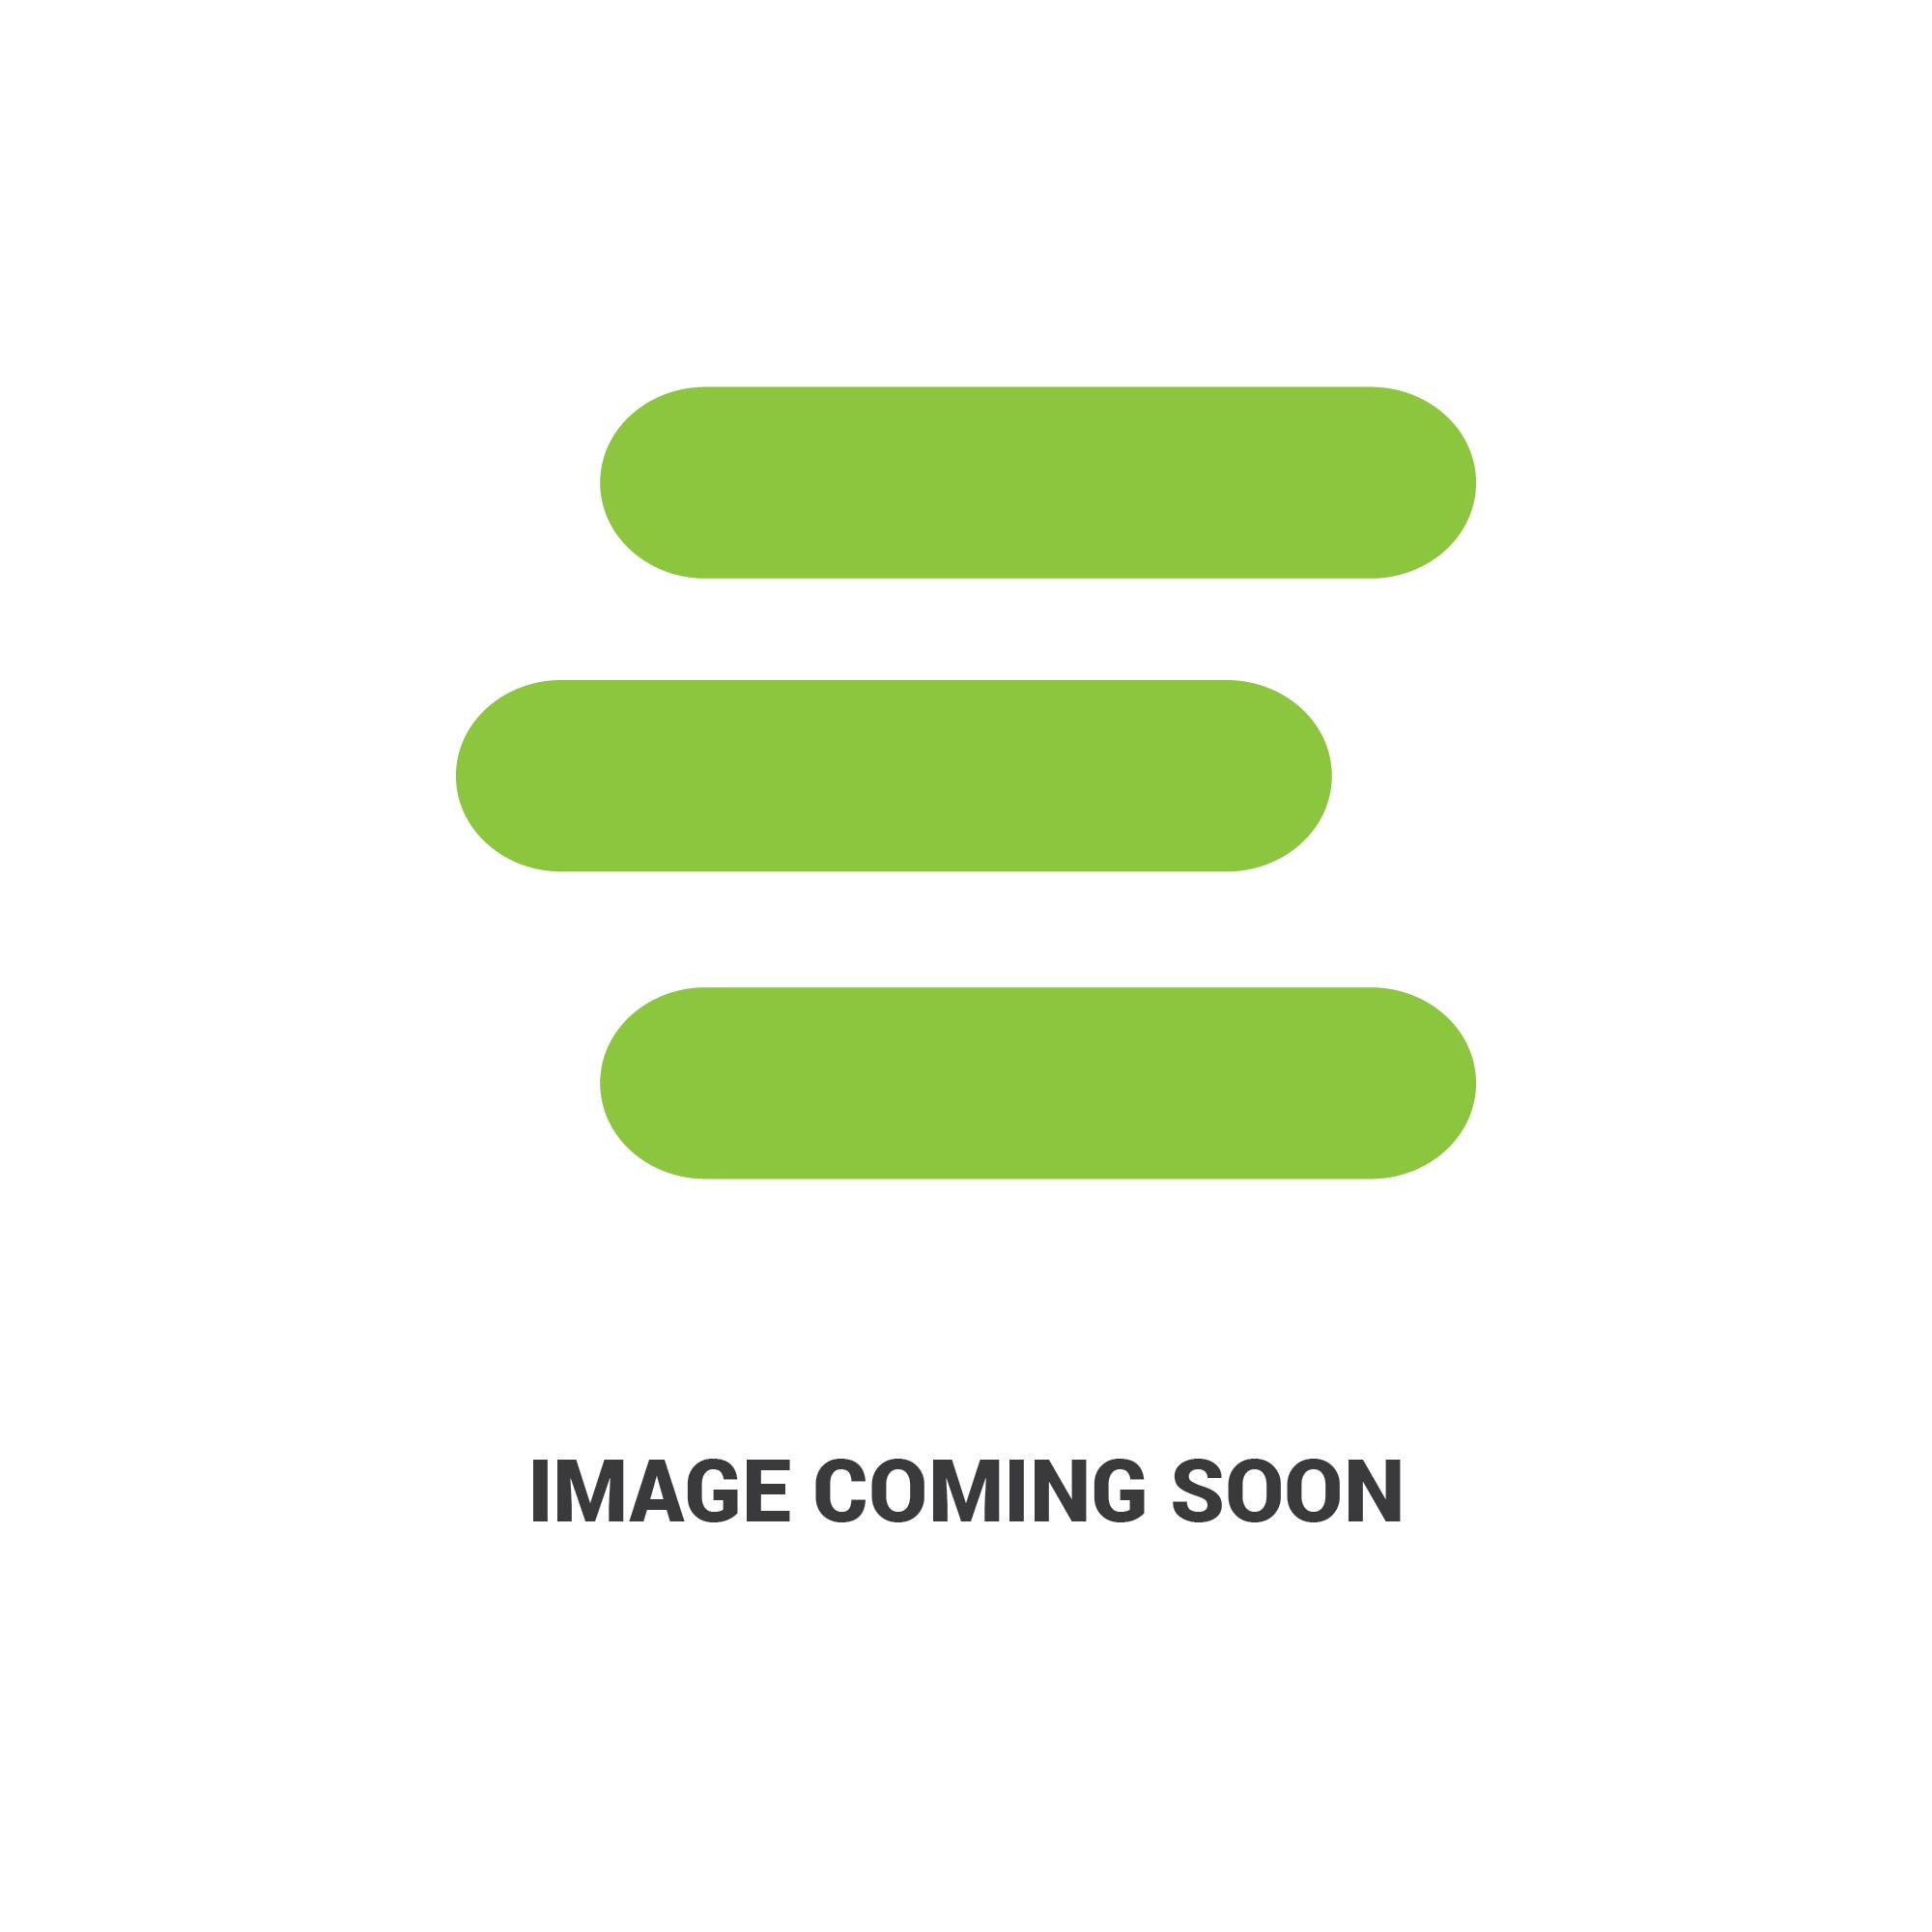 E-31351-76190edit 2.jpg